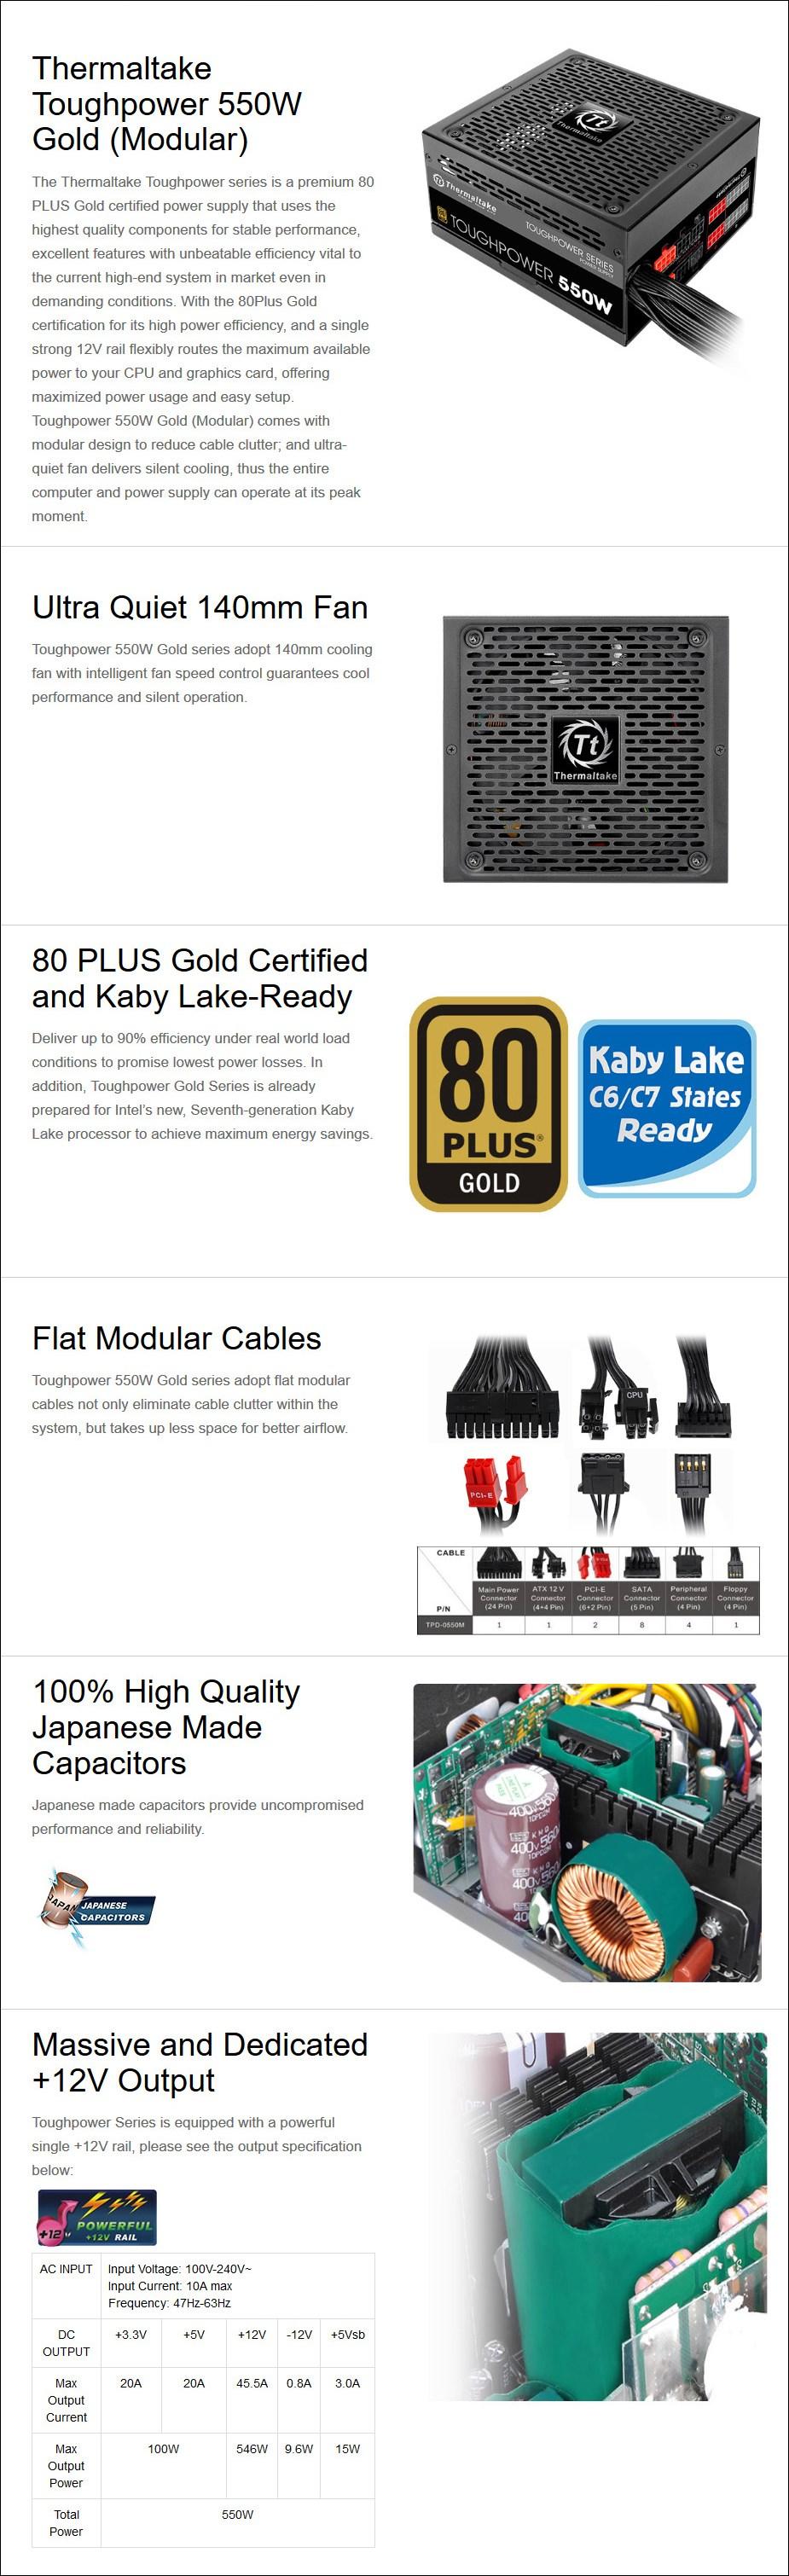 Thermaltake Toughpower GOLD 550W Modular Power Supply - Desktop Overview 1